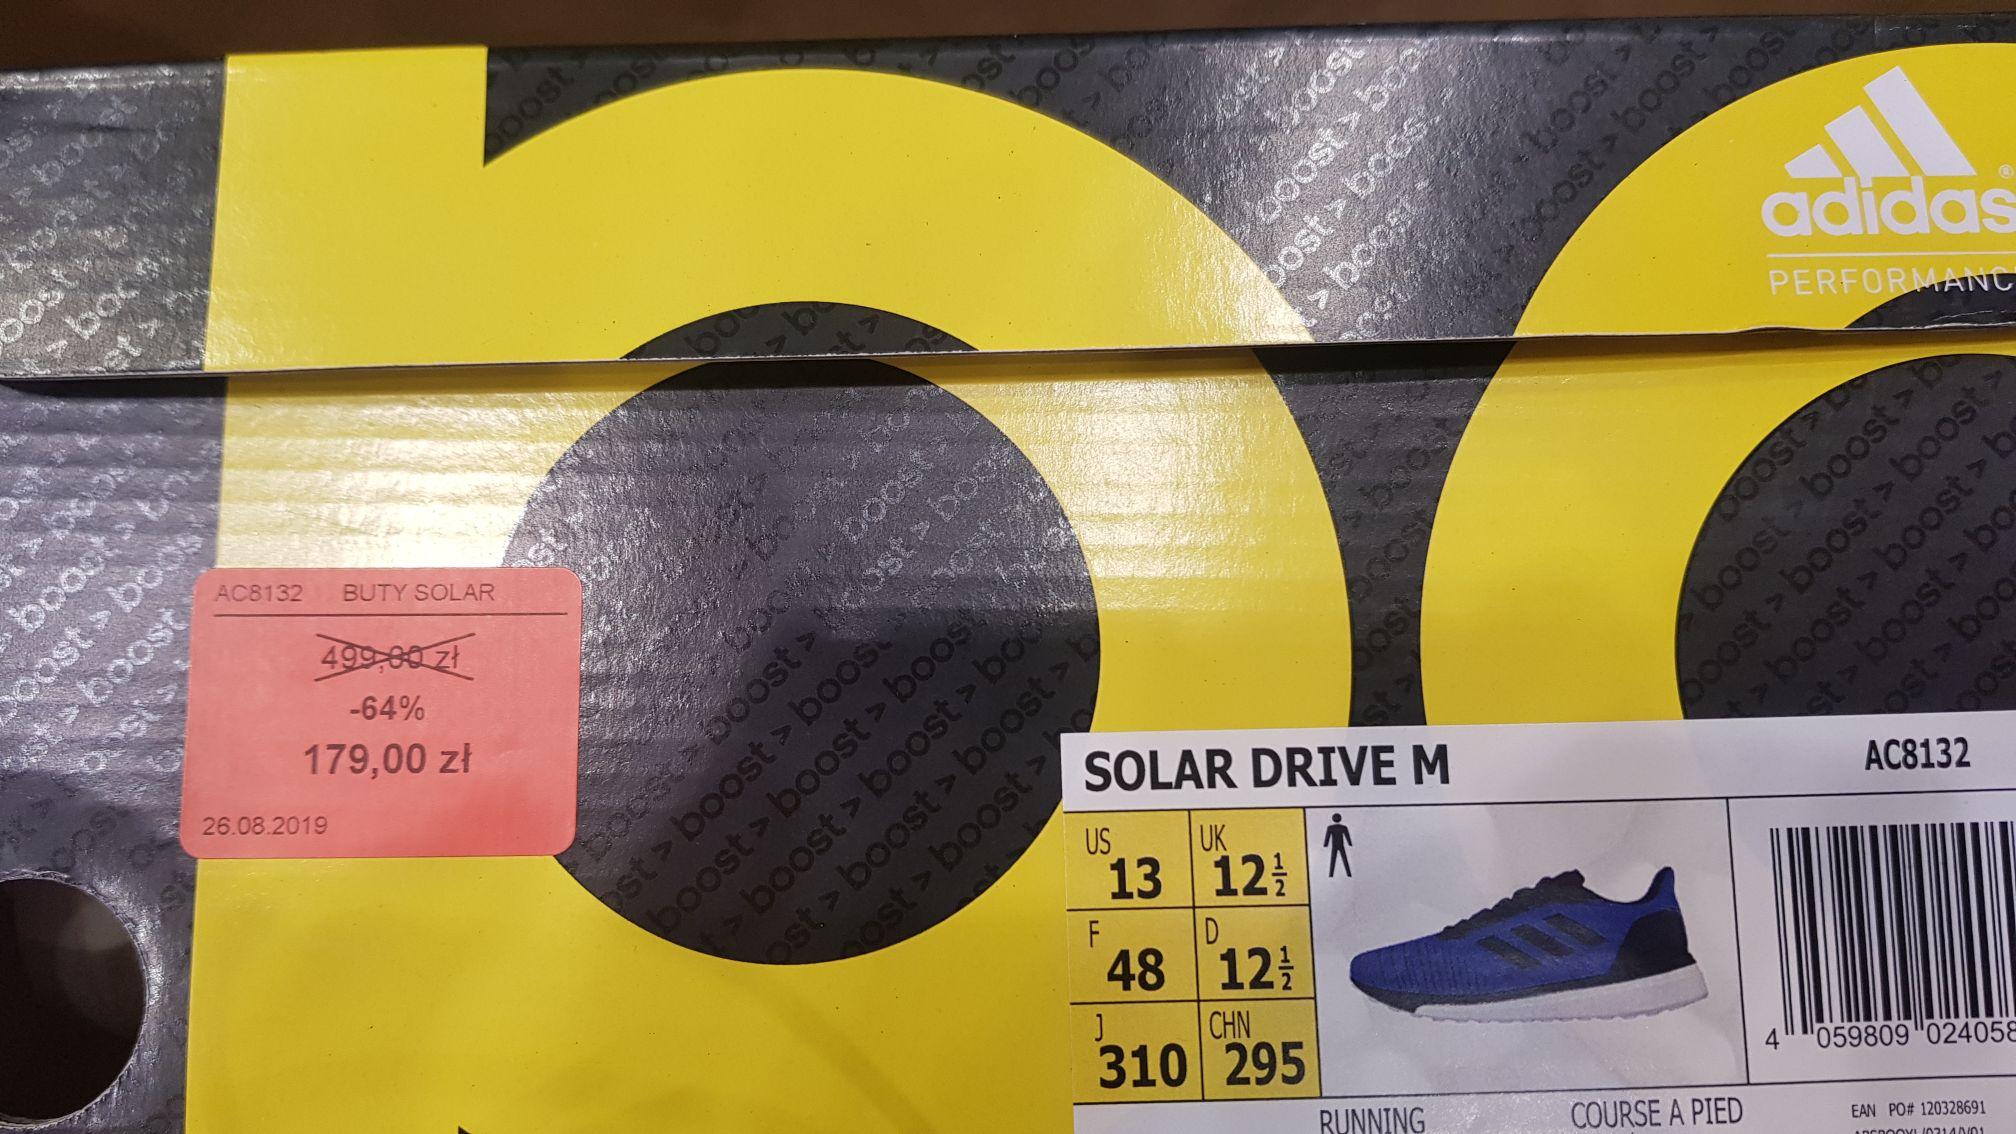 Buty Adidas Solar drive M